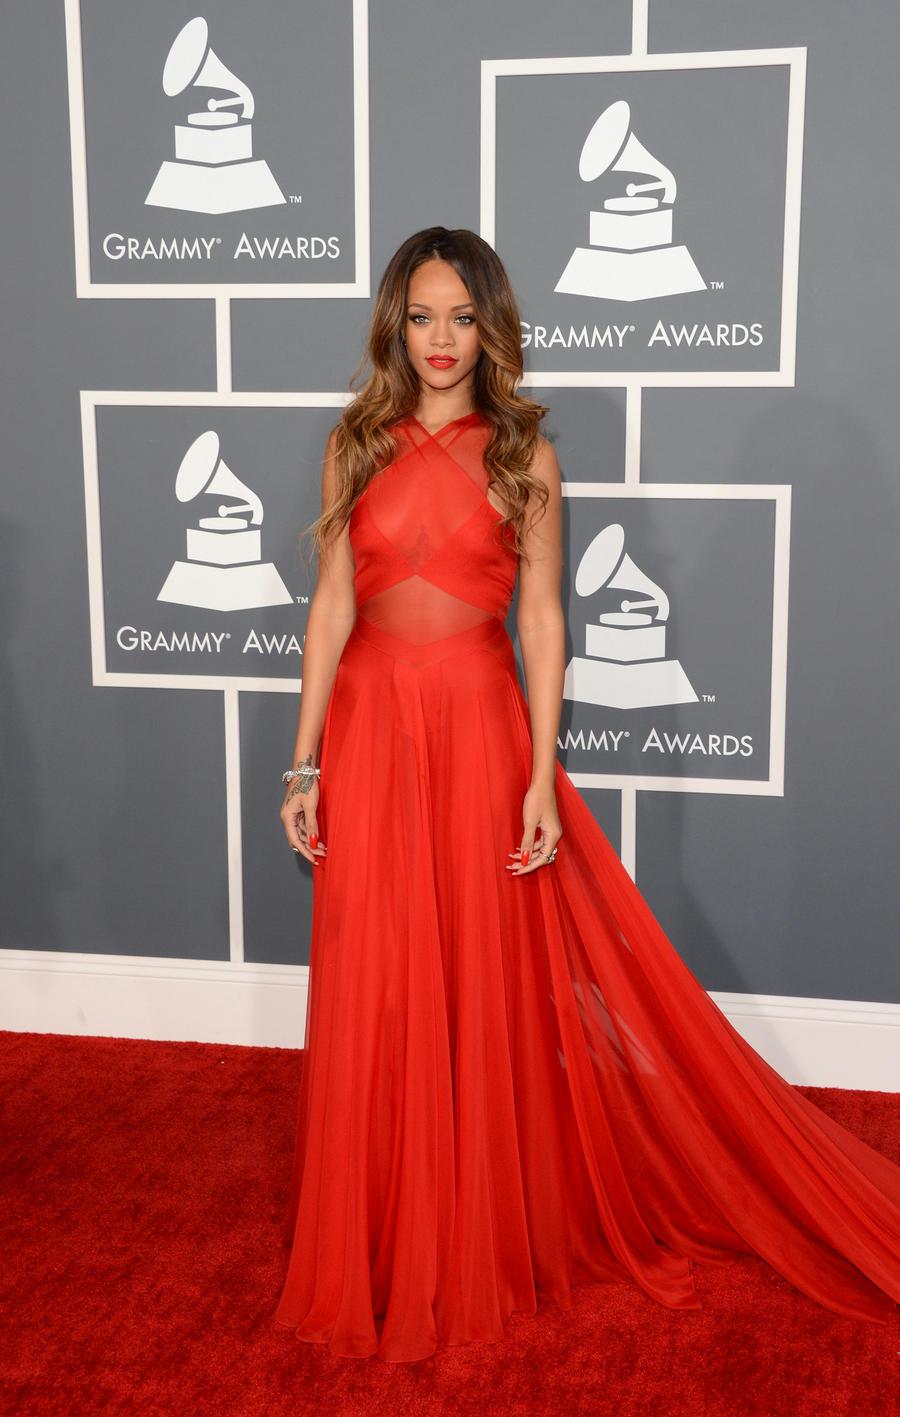 2016 Gremmy Awards Red Chiffon Backless Sexy Rihanna ...